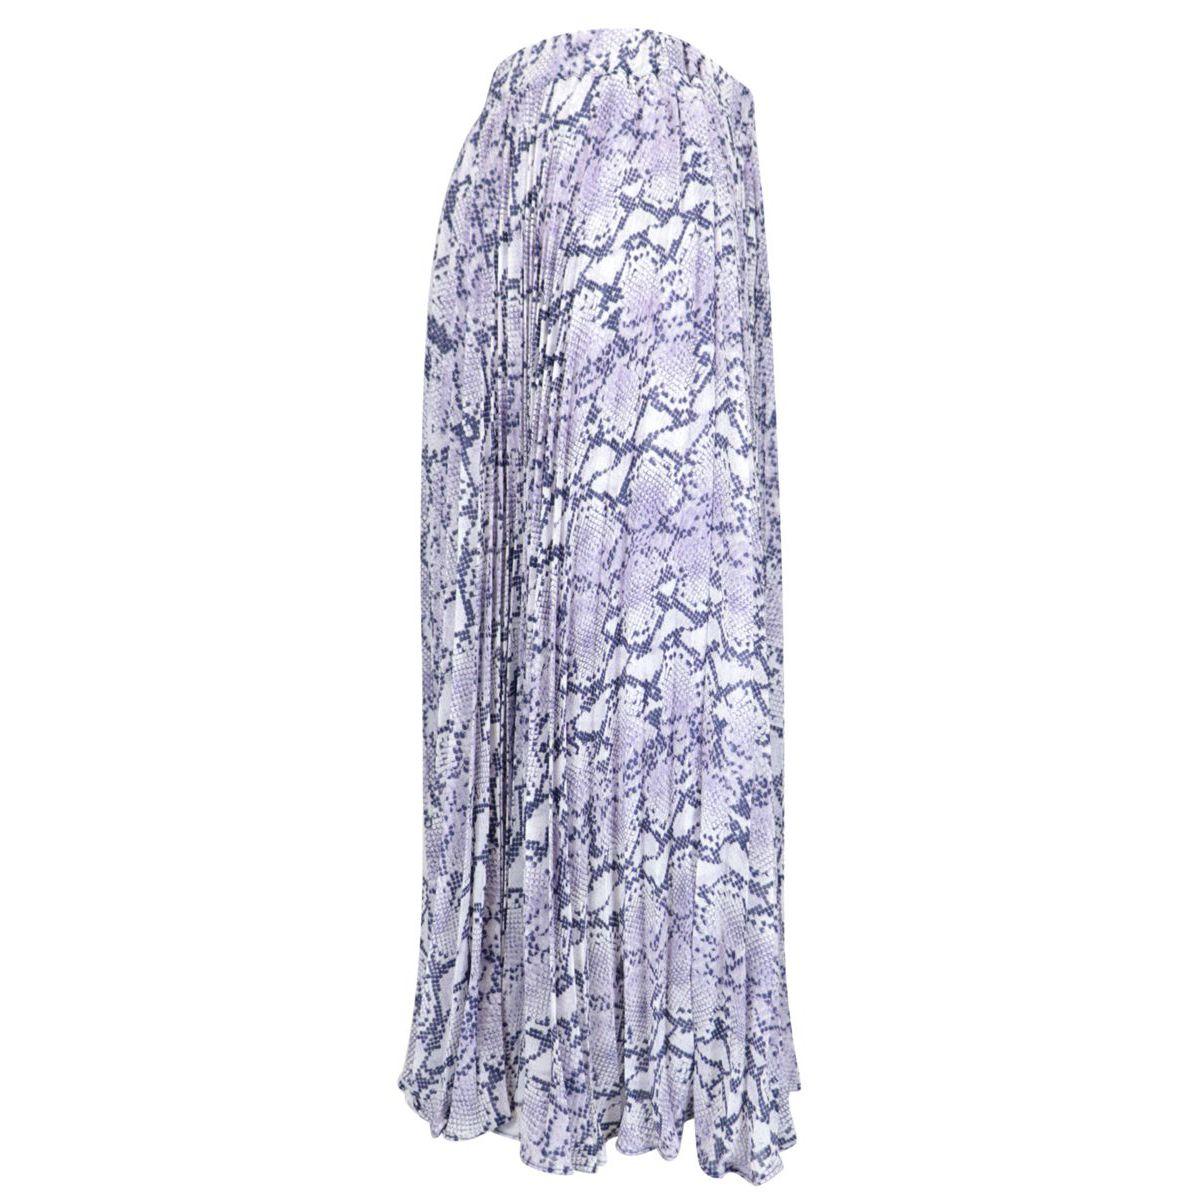 Pleated fabric skirt with python print Lavender Michael Kors